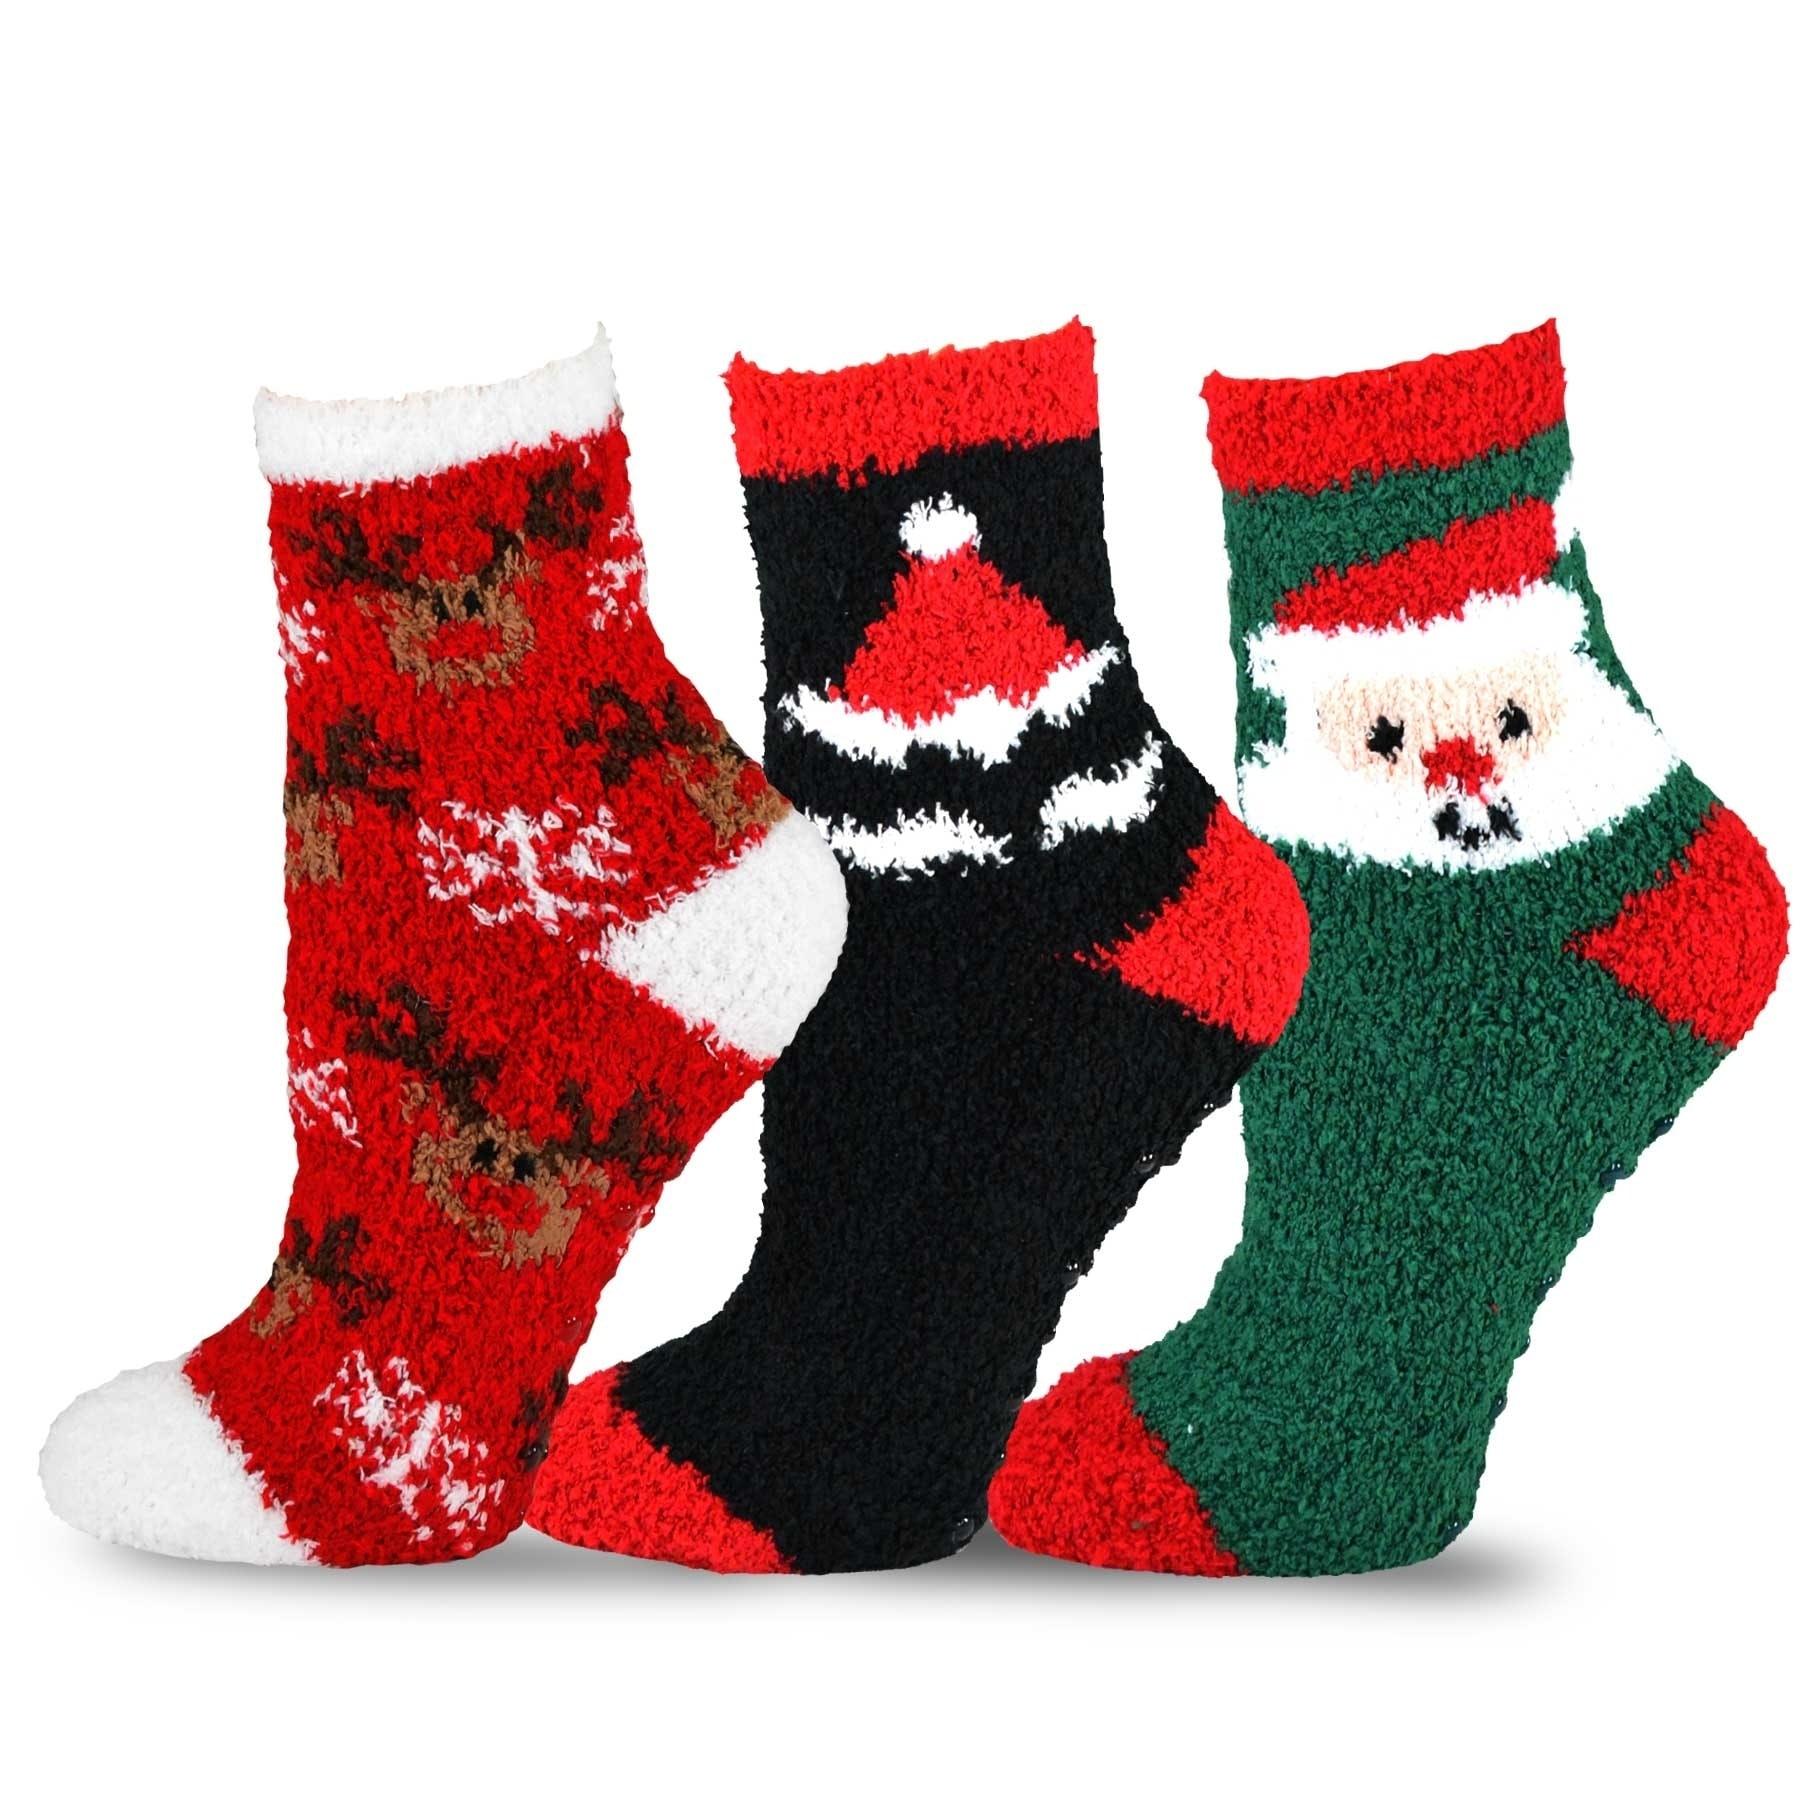 Christmas Fuzzy Socks.Teehee Christmas Holiday Cozy Fuzzy Crew Socks 3 Pack For Women